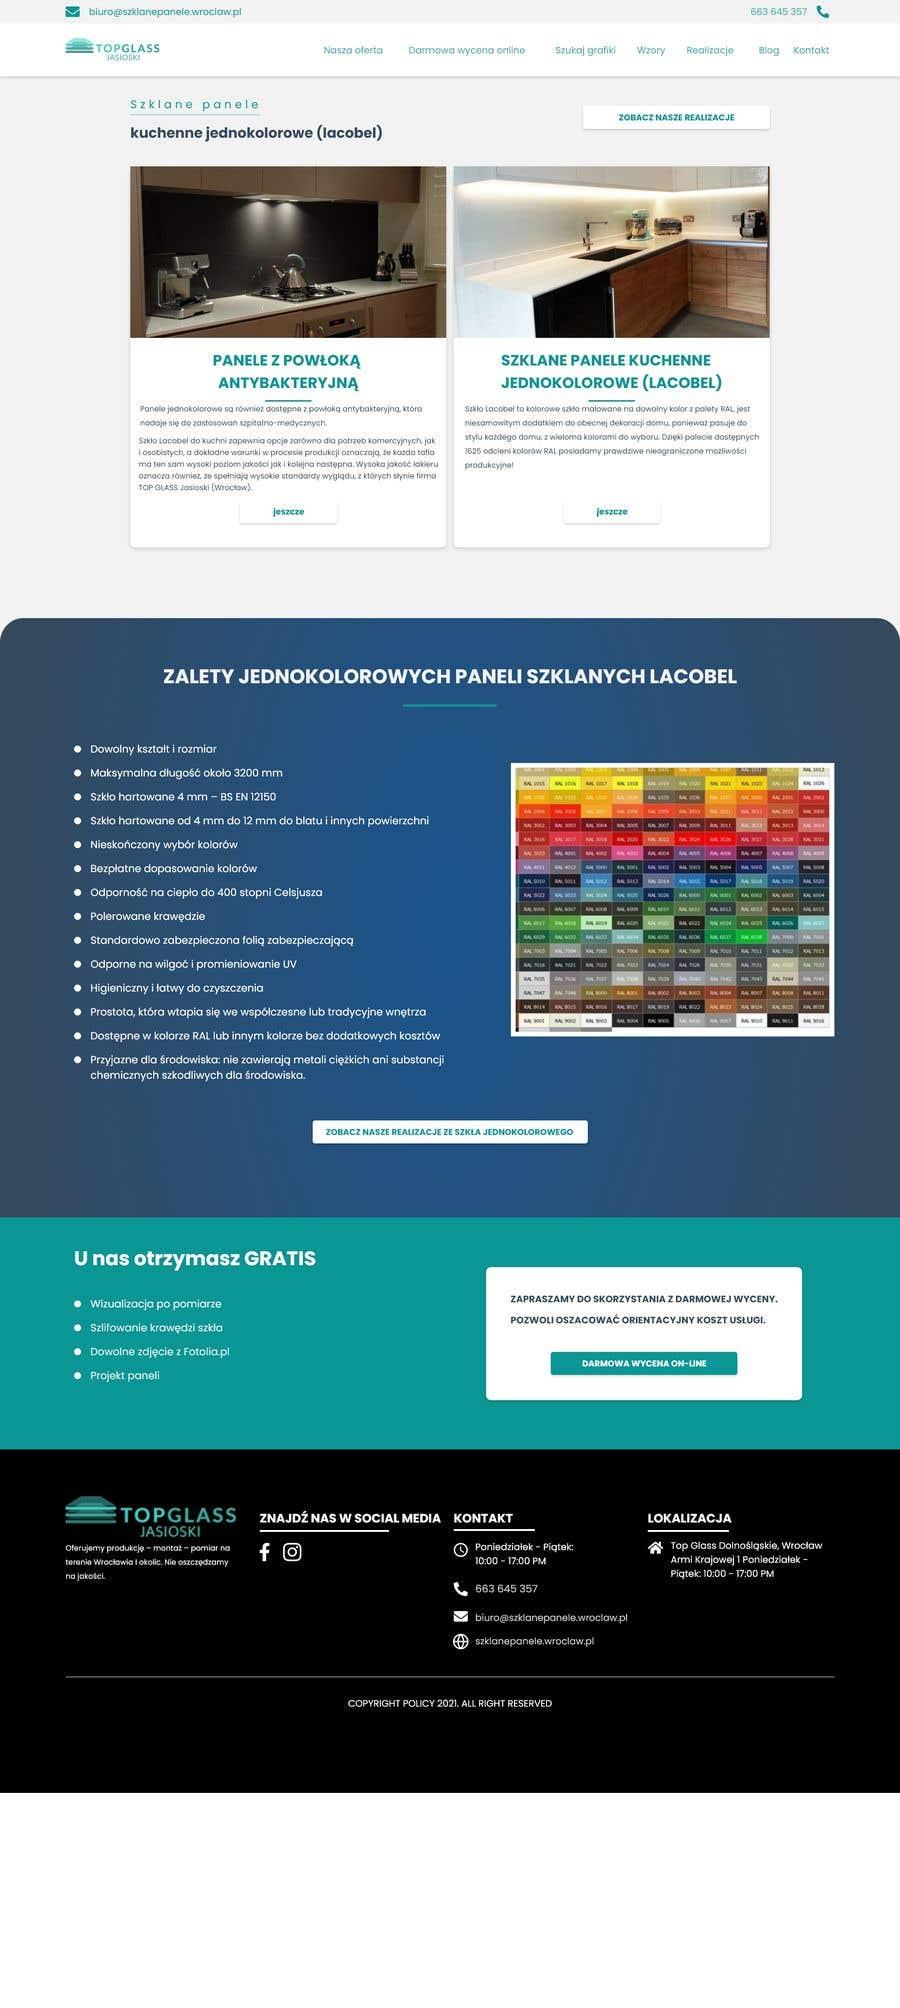 Proposition n°                                        2                                      du concours                                         Re-design website for easier UX and UI